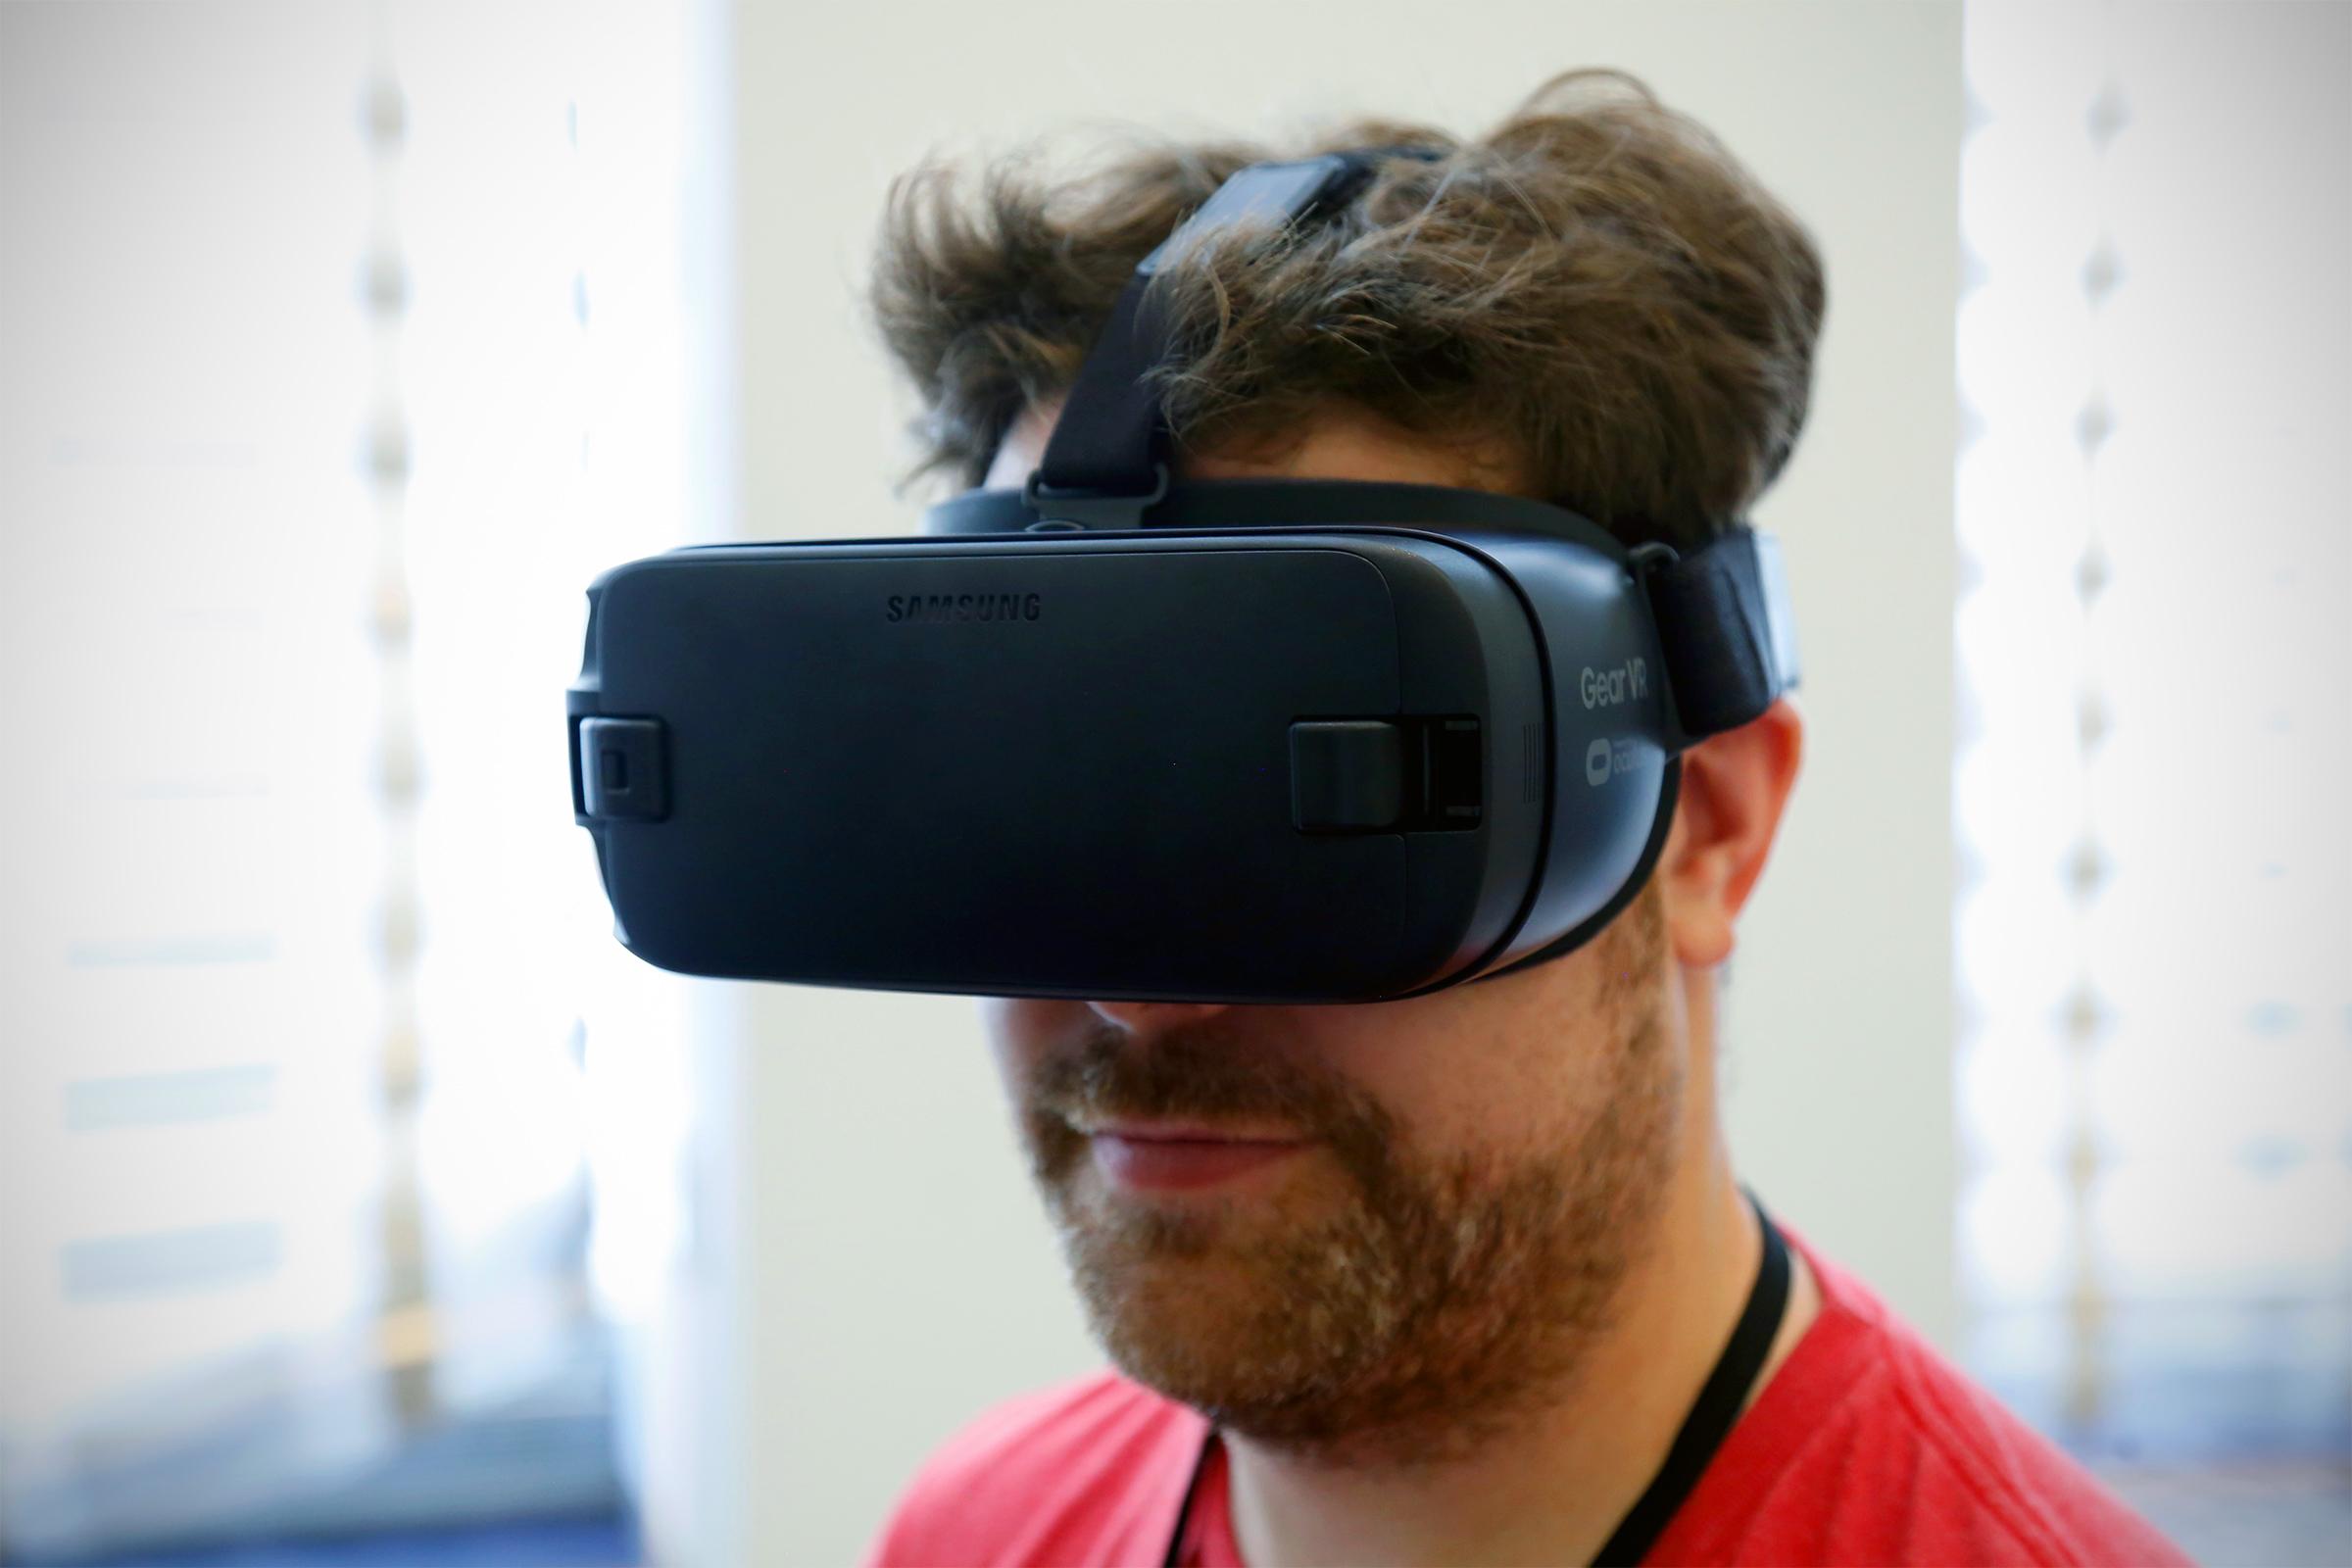 Gear VR 也随 Note 7 的发布一同更新啦